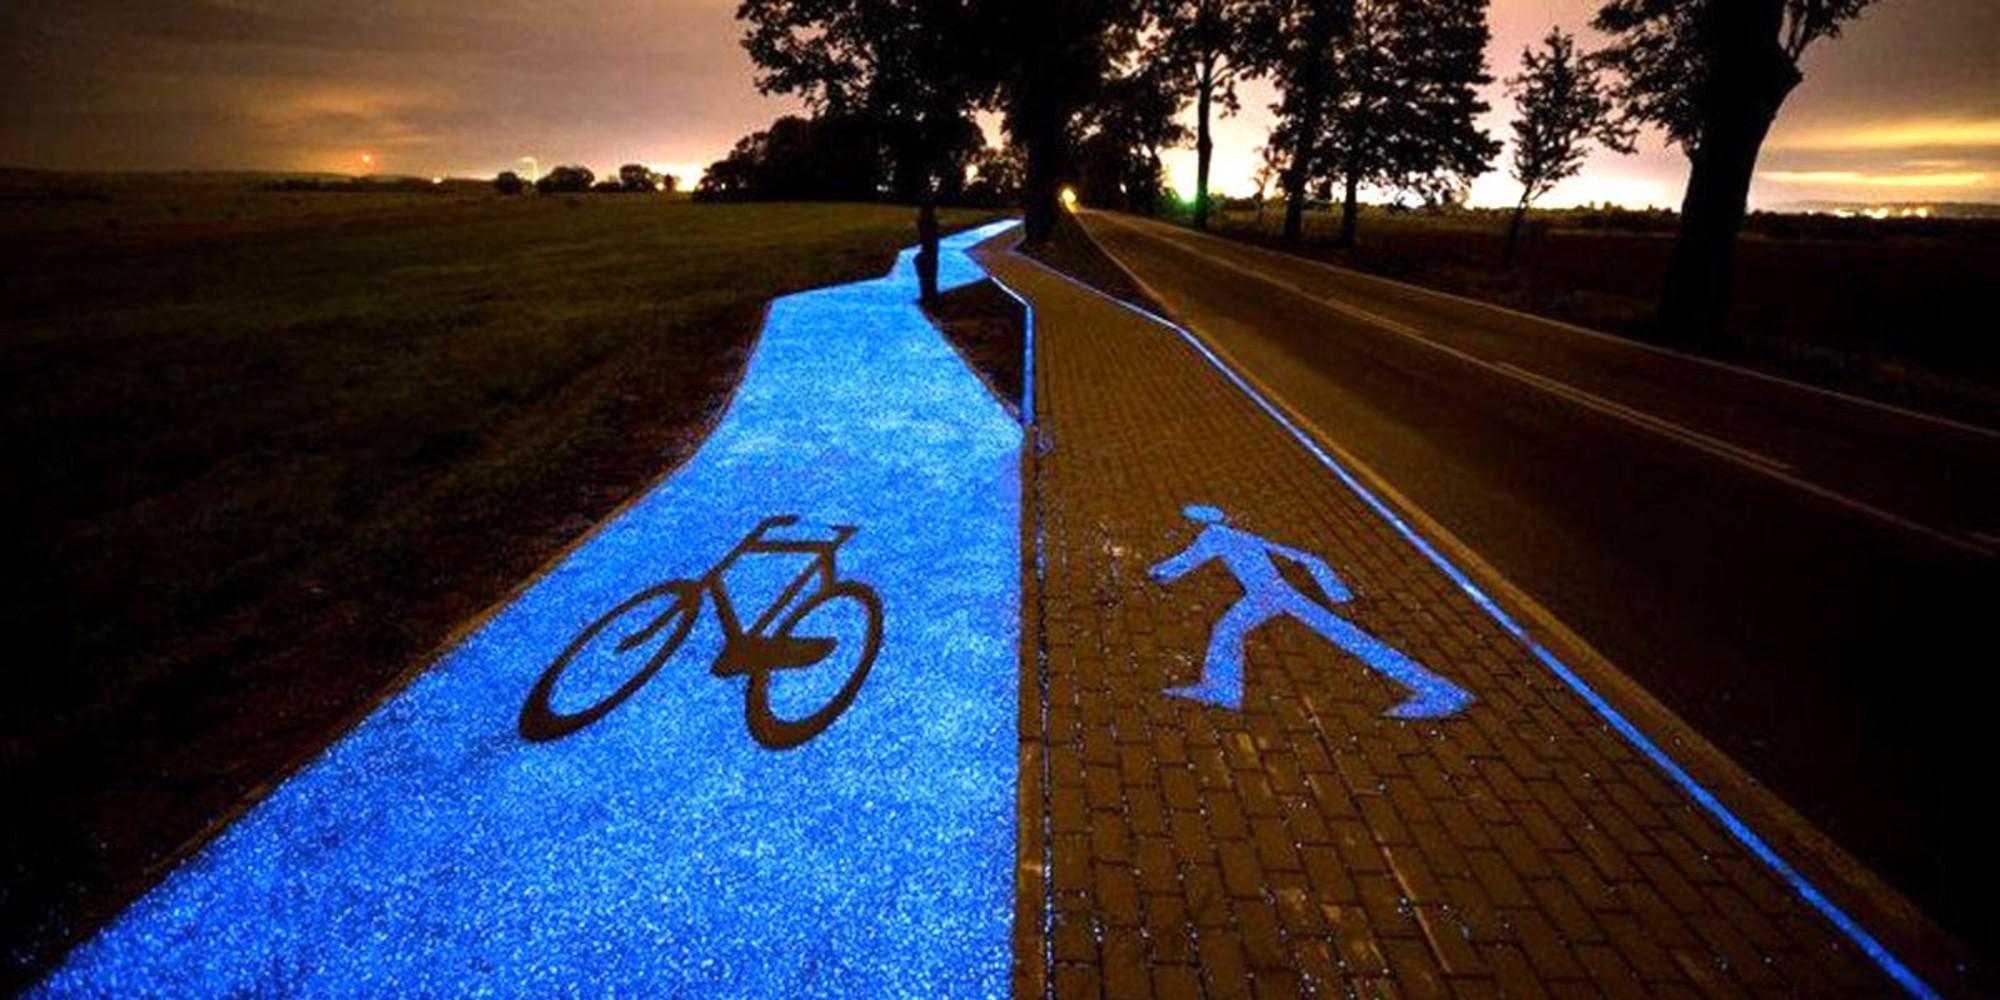 Camino fotoluminiscente para peatones y bicicletas